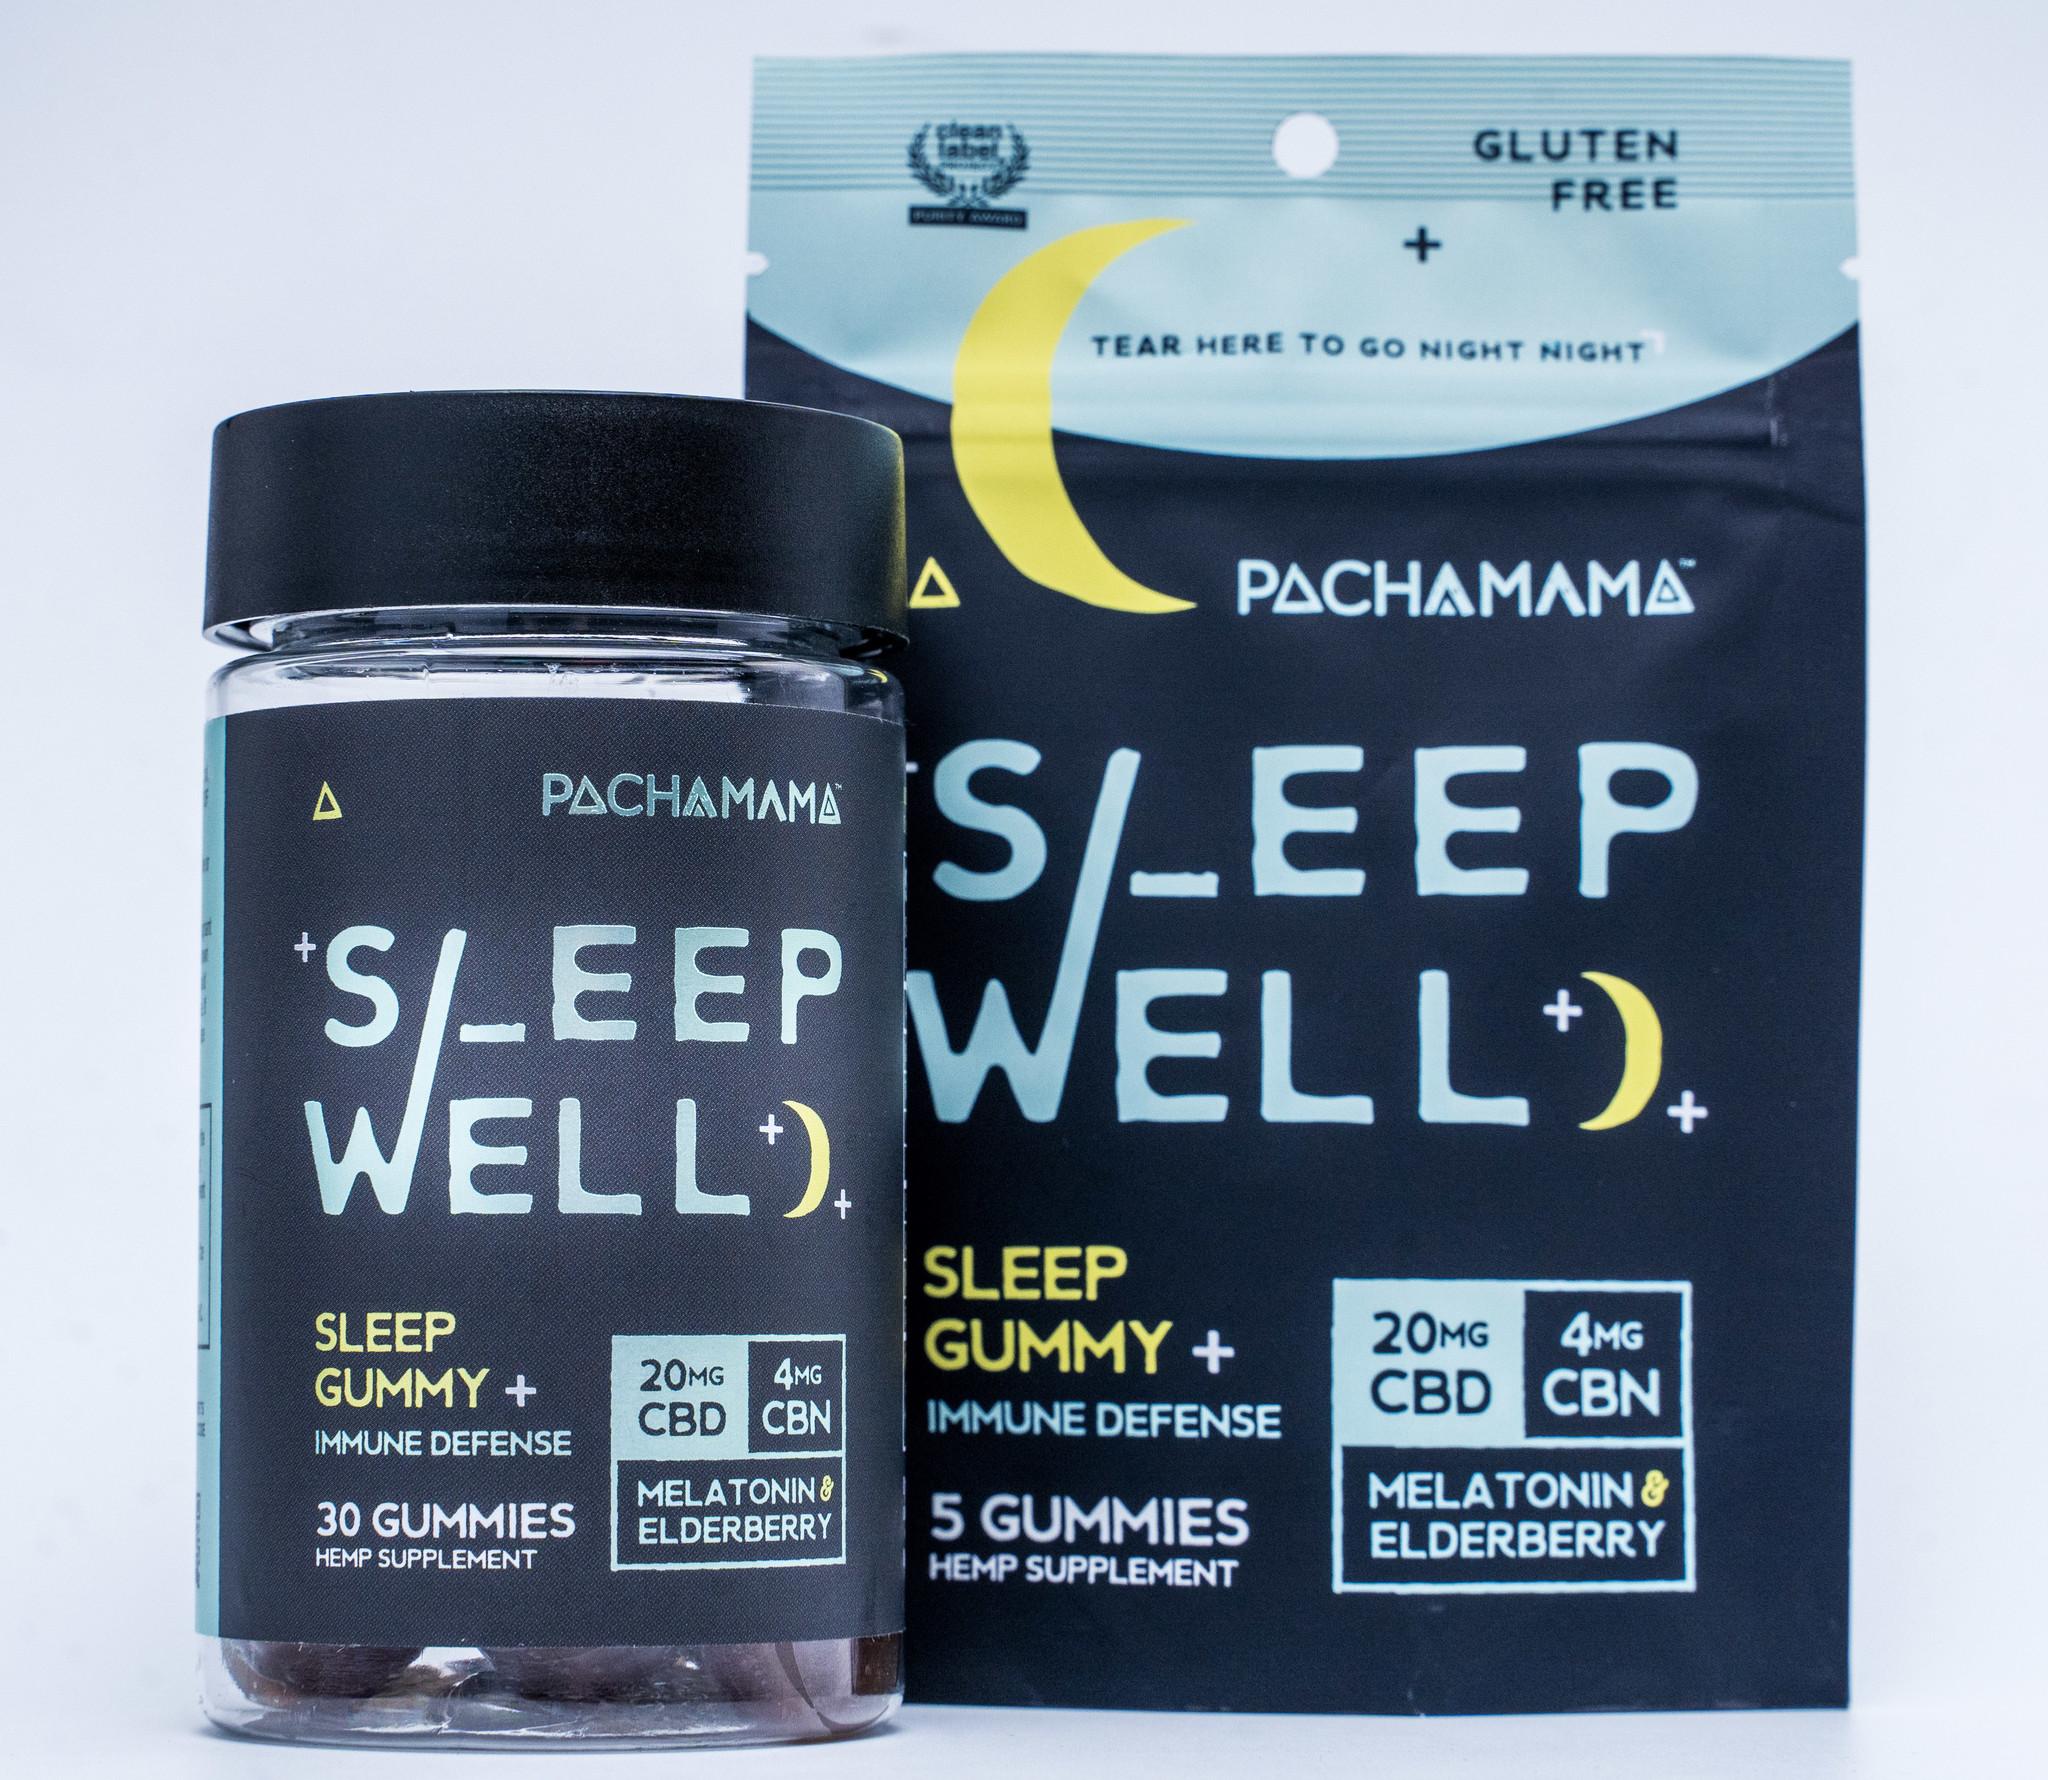 PachaMama CBD | SLEEP GUMMIES | 20mg CBD | 4mg CBN | 2mg MELATONIN | 35mg ELDERBERRY | 5 COUNT